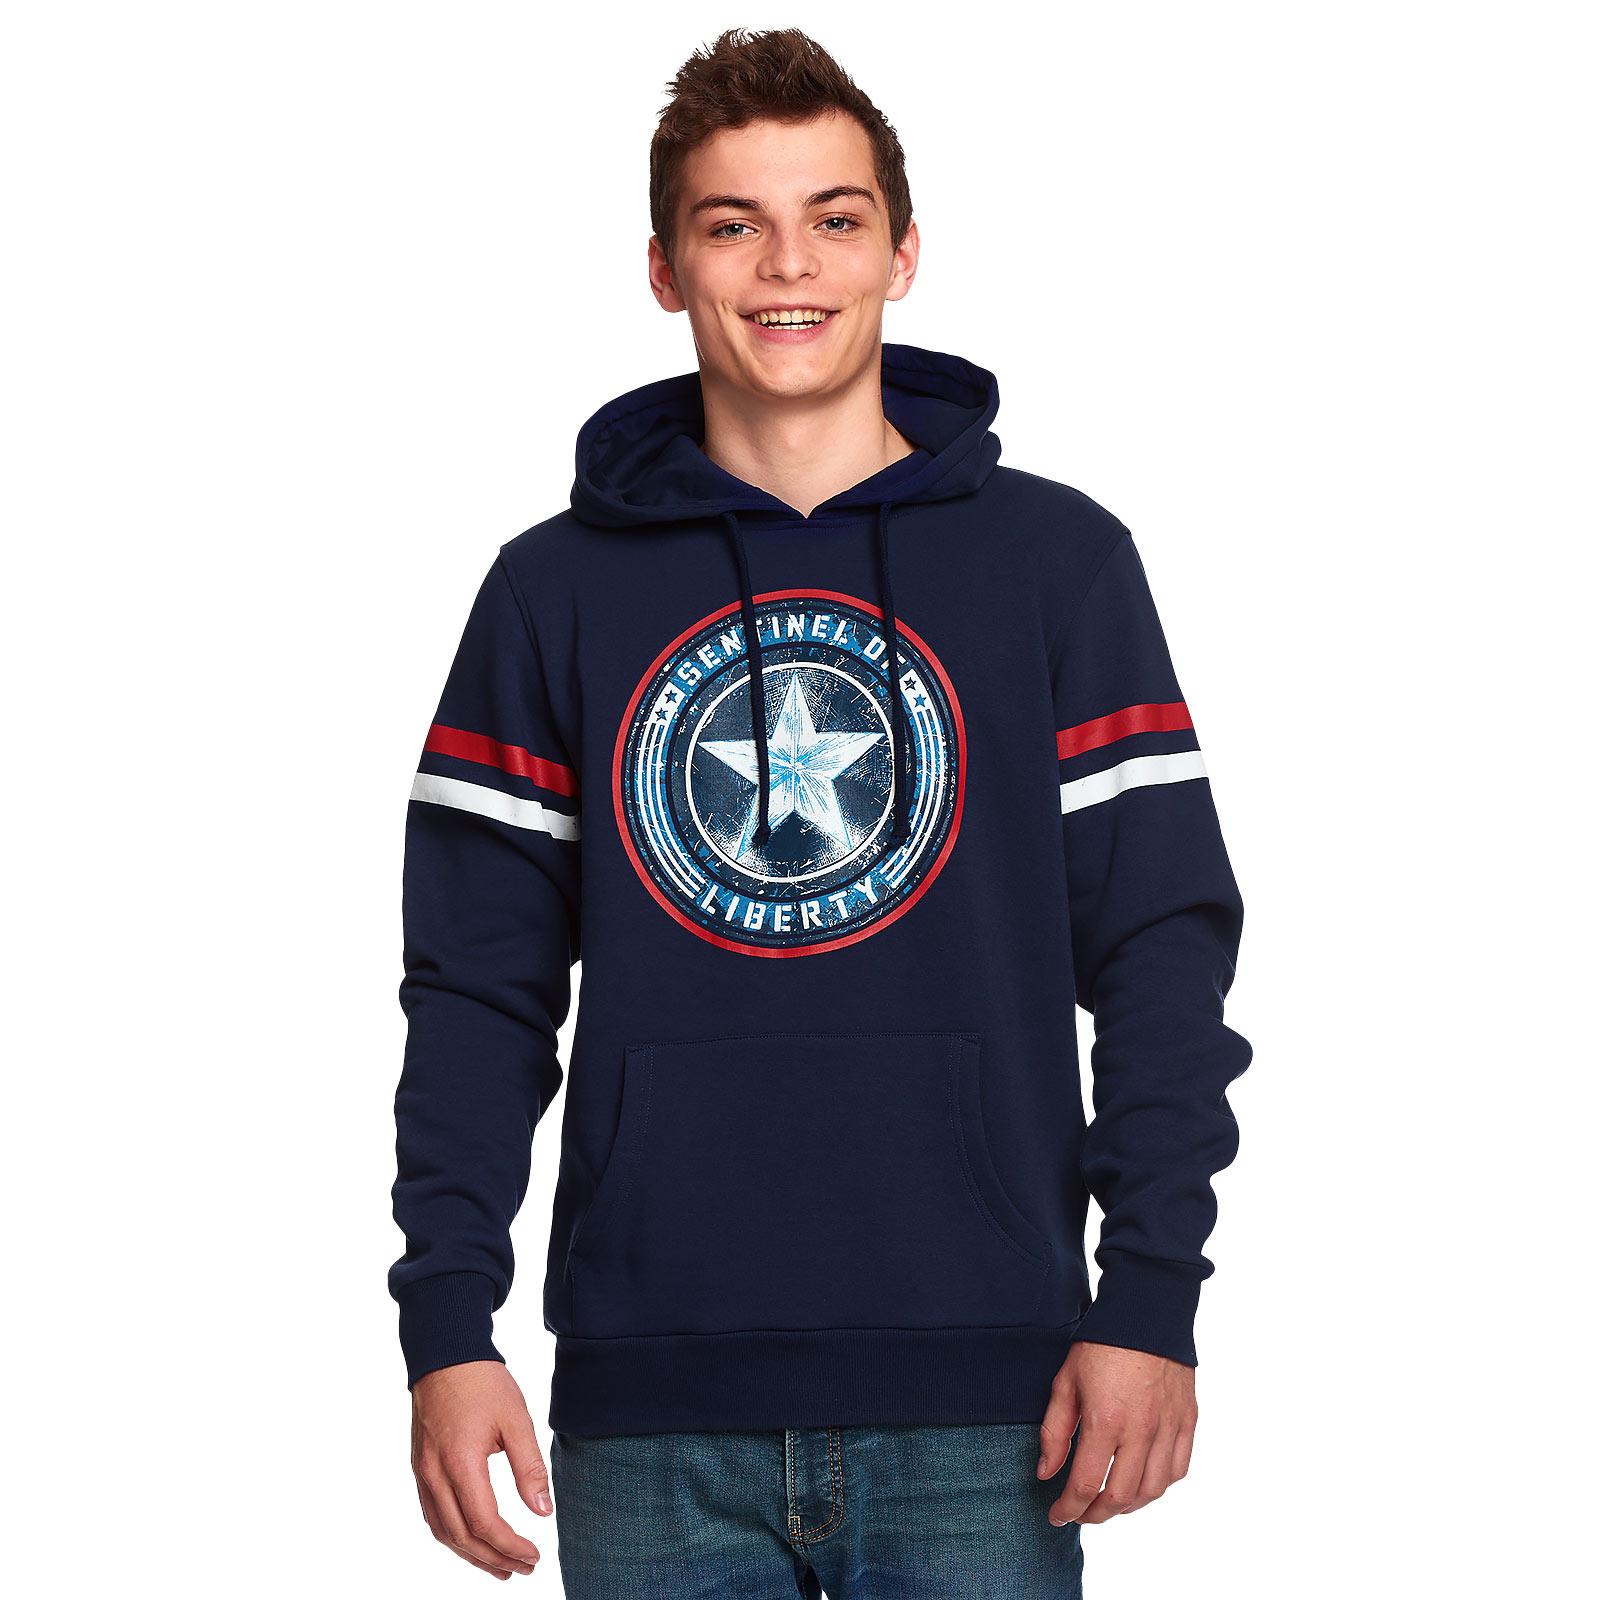 Captain America - Sentinel of Liberty Hoodie blau